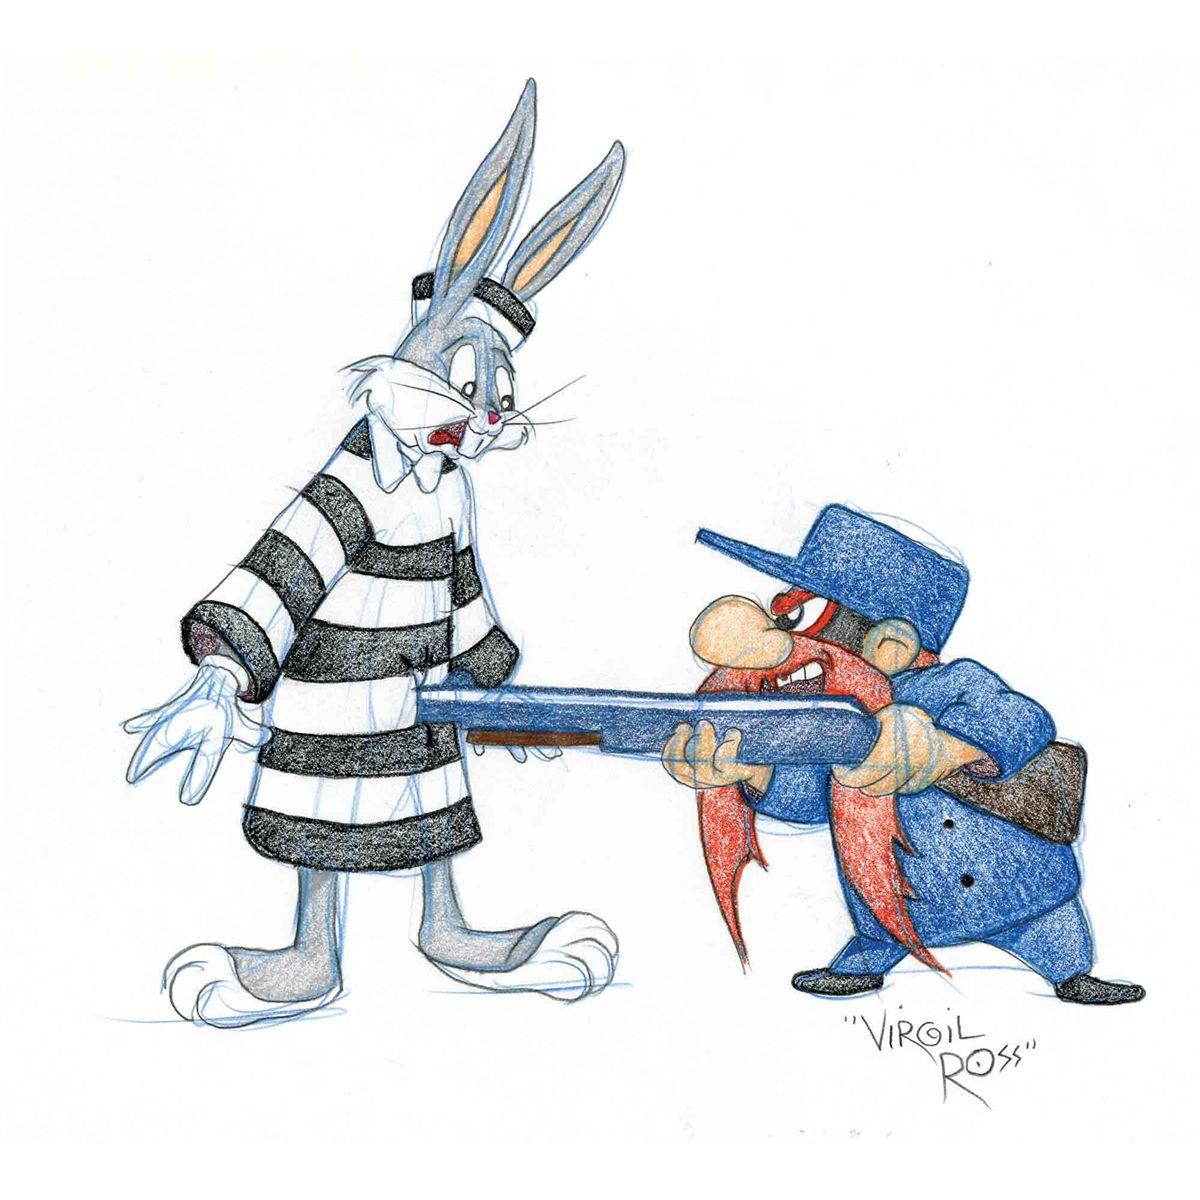 1200x1200 Bugs Bunny And Yosemite Sam Original Virgil Ross Drawing